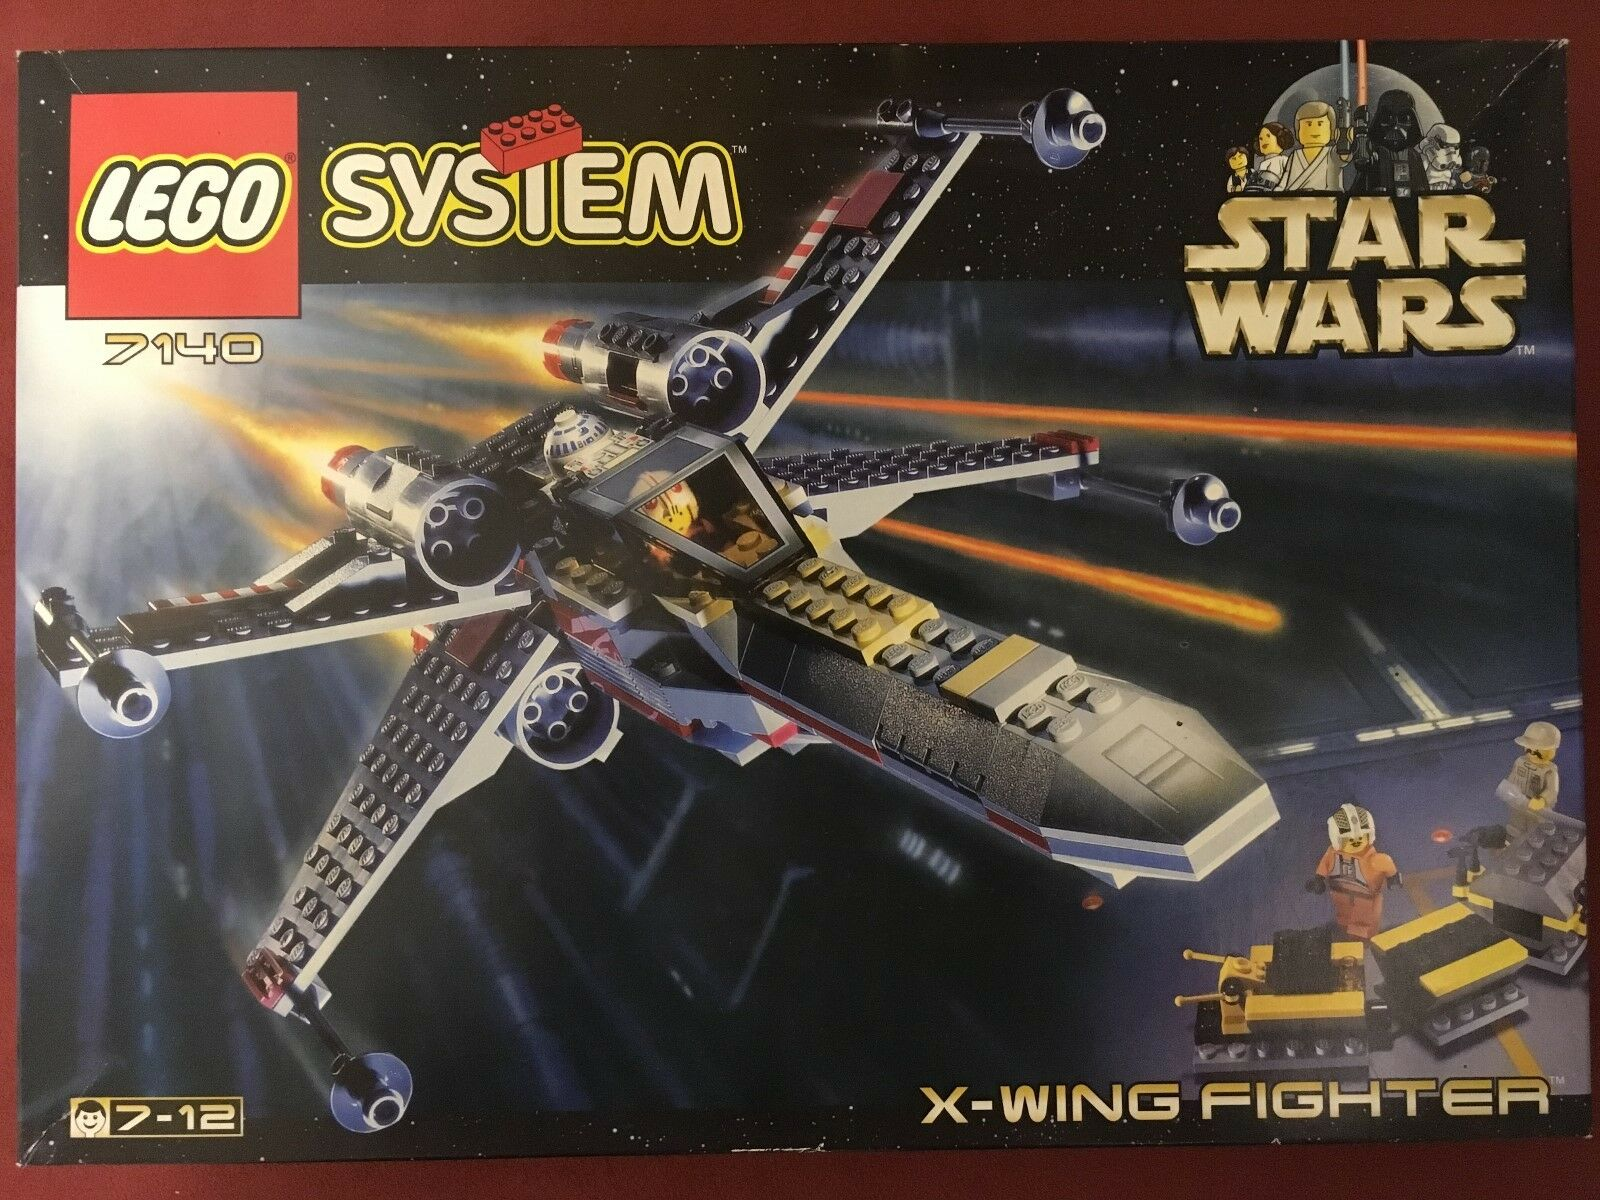 LEGO ® 7140 sistema Star Wars X-Wing Fighter 1999 OVP & SIGILLATO  SEALED